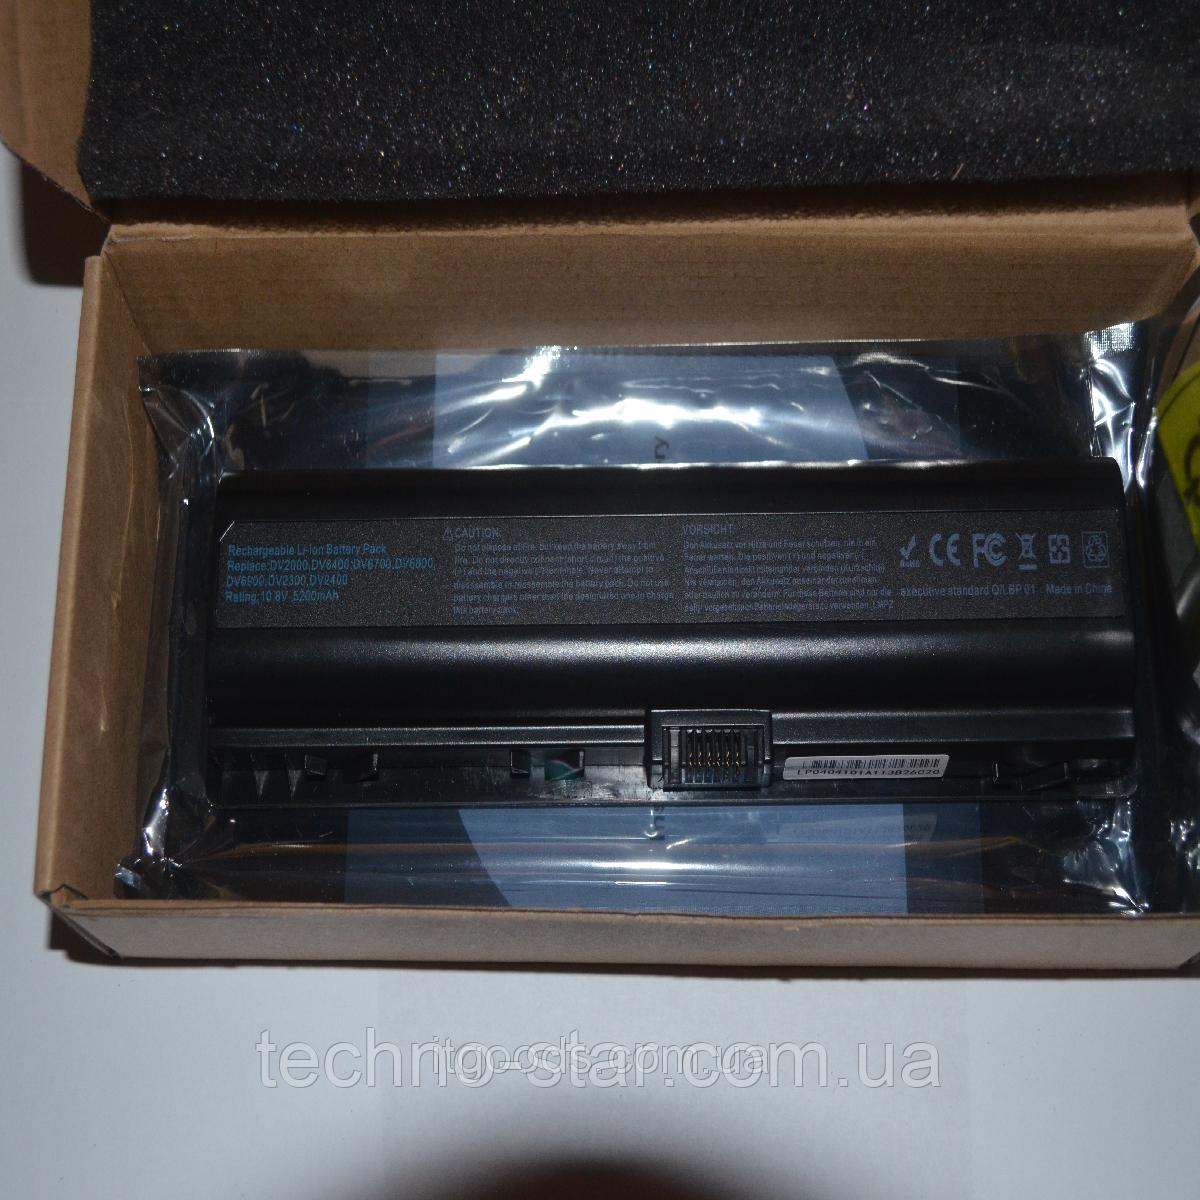 Акумулятор HP Compaq DV2000 DV2100 V3000 EV089AA HSTNN-DB31 HSTNN-LB42 HSTNN-W20C